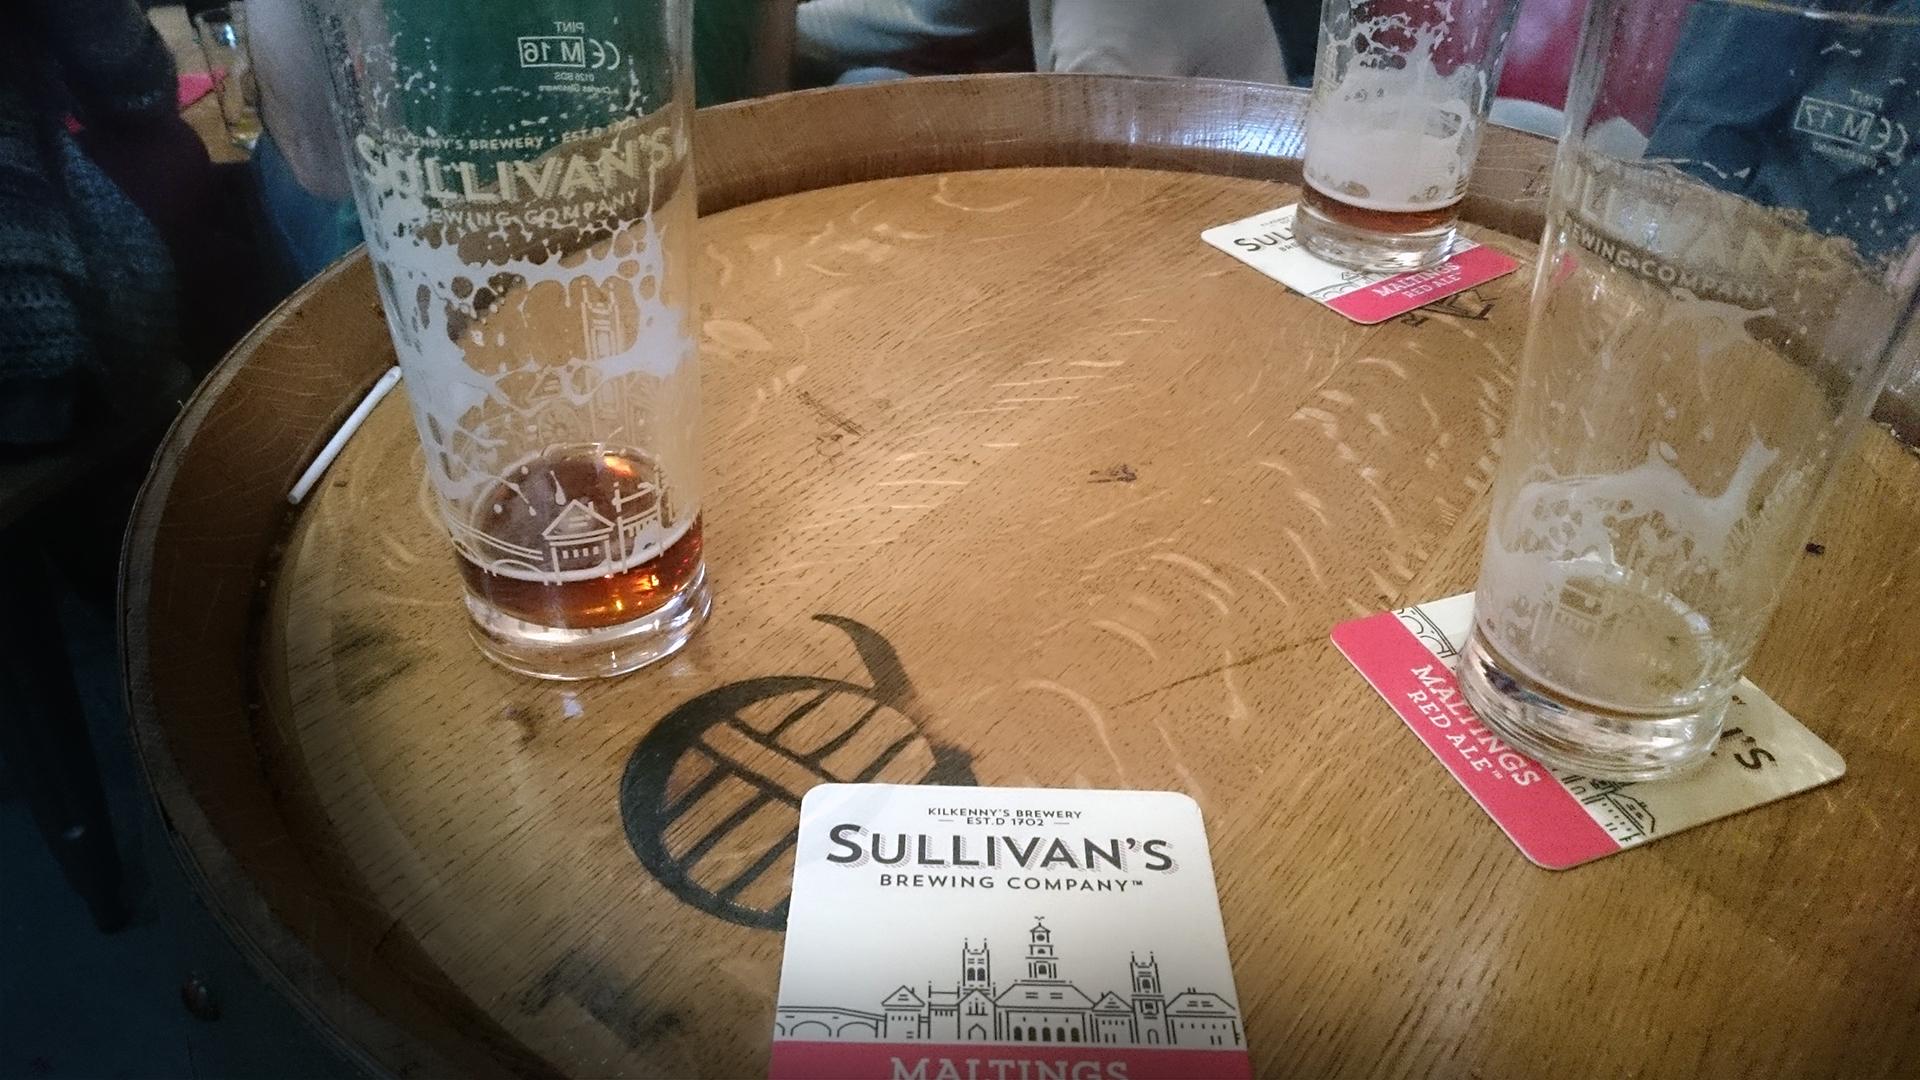 Sullivans kilkenny brewery